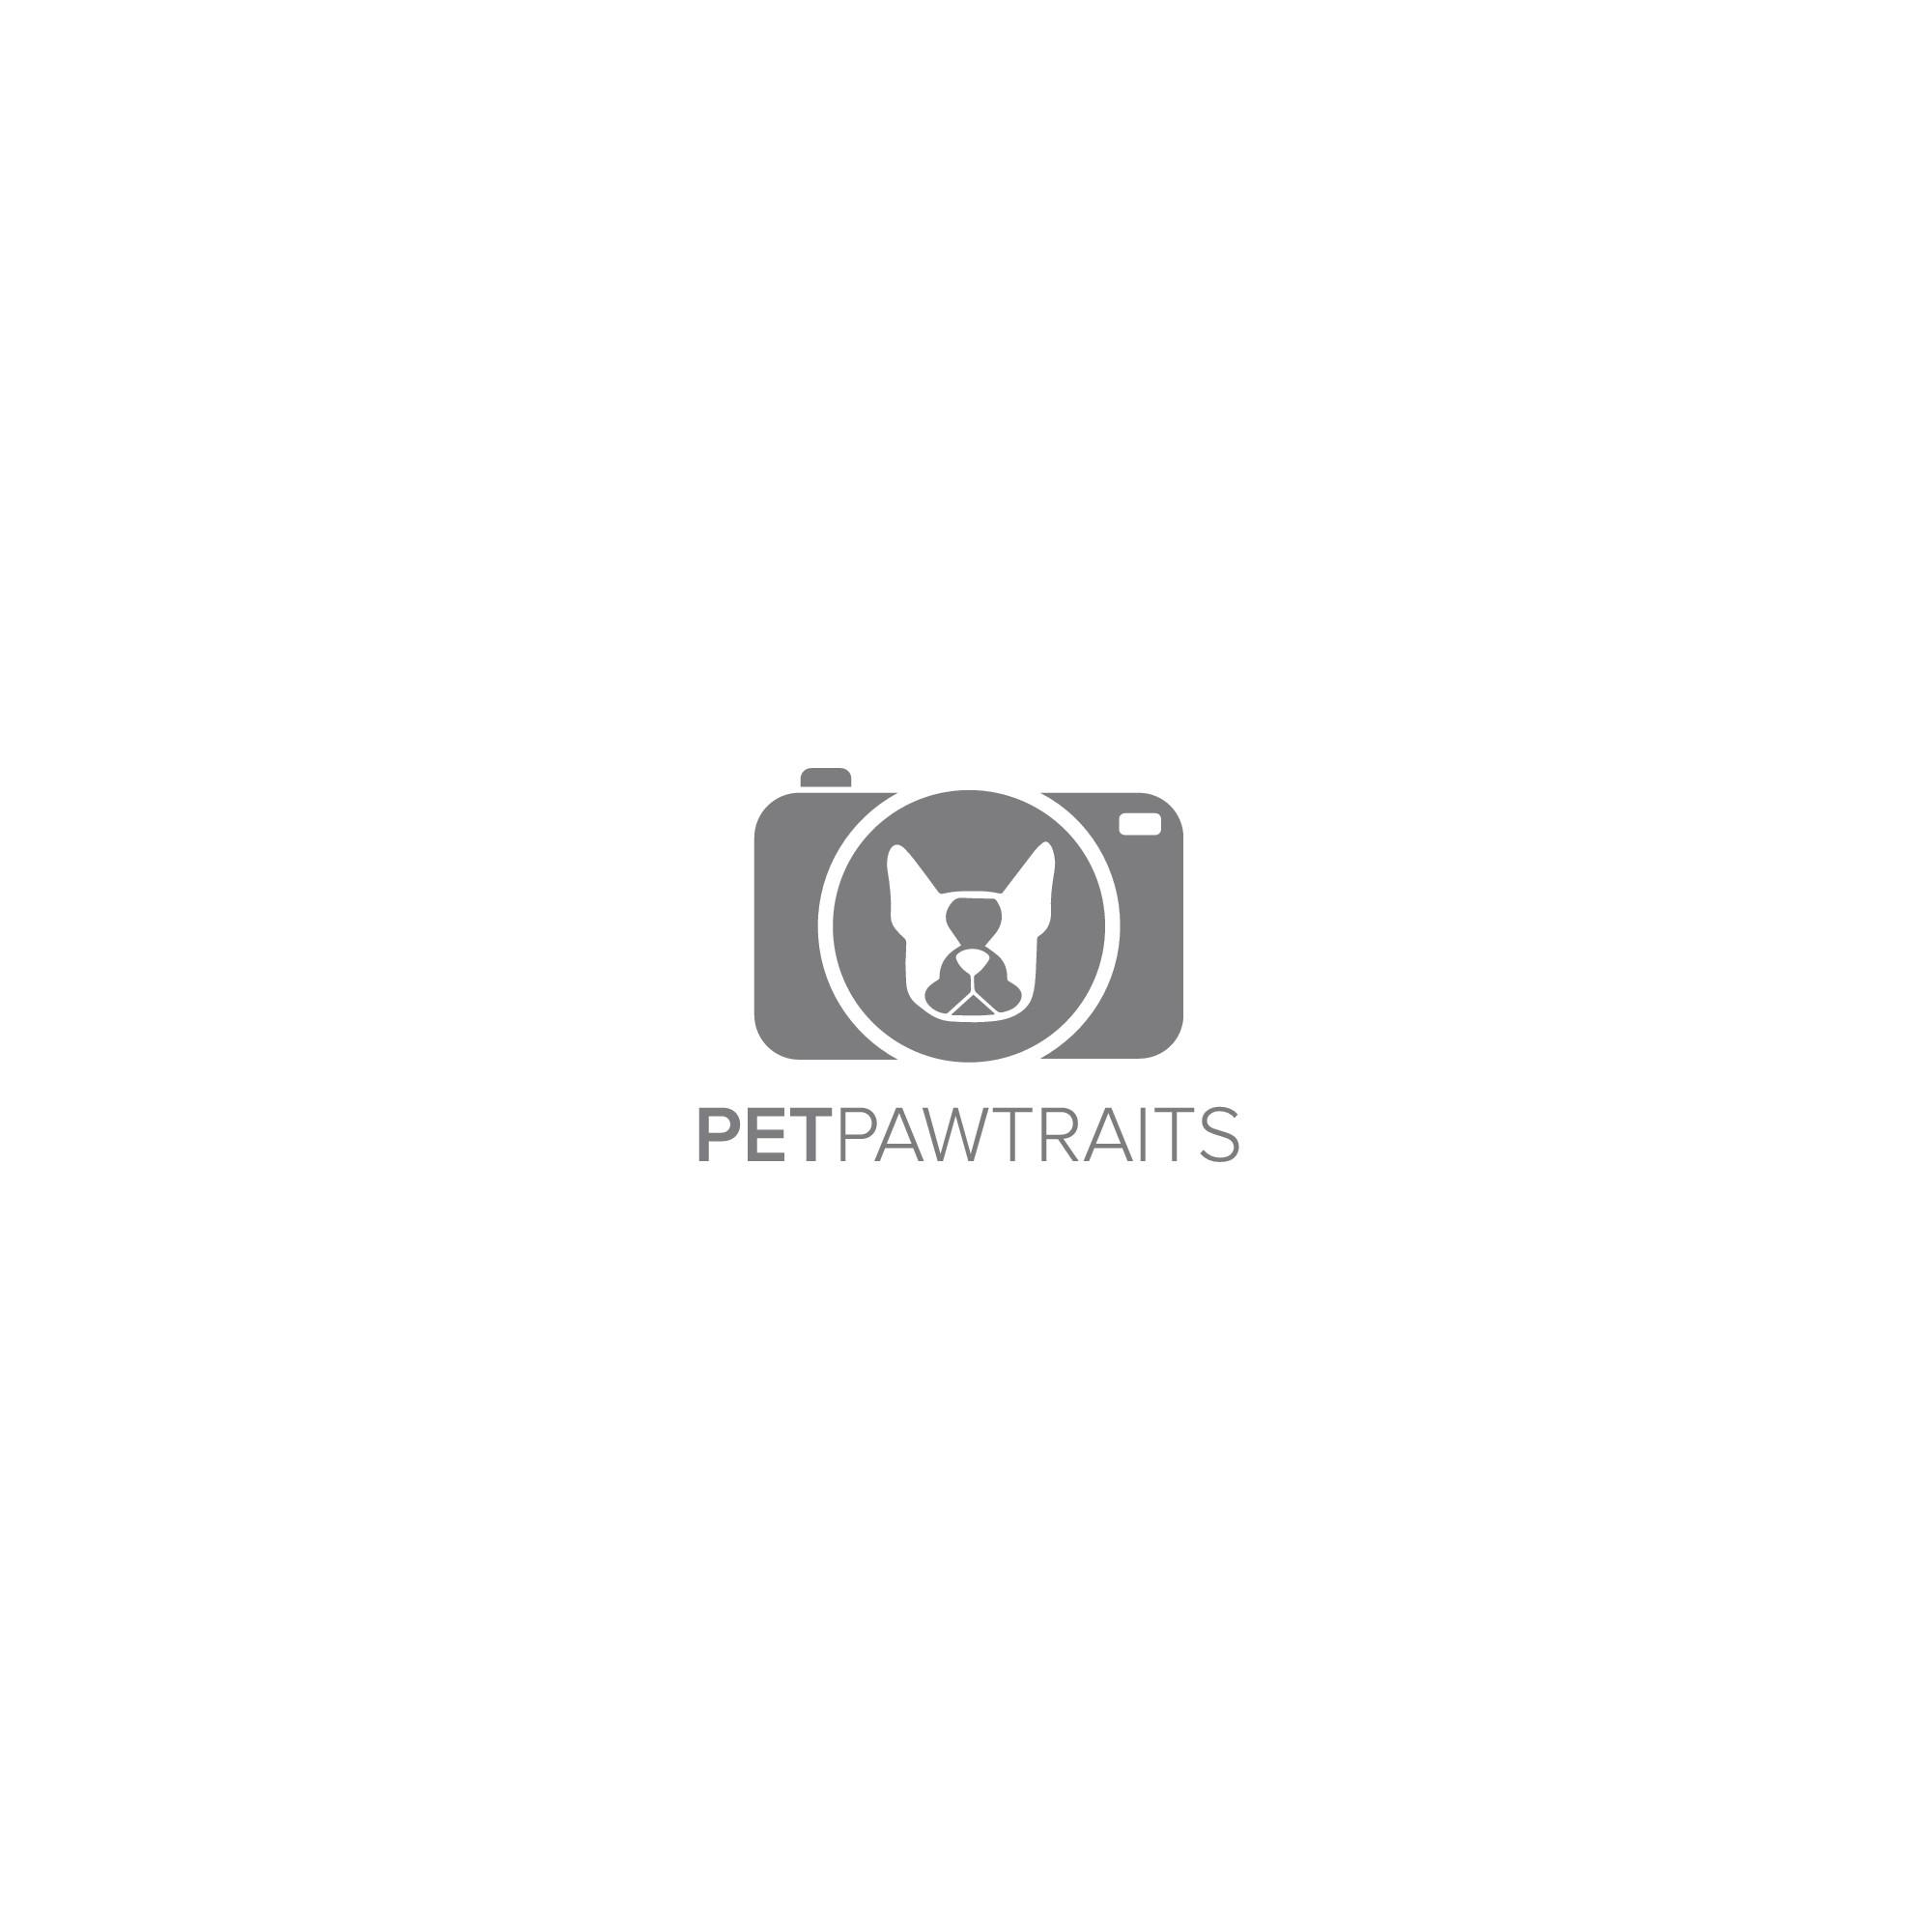 Logo design for pet photography